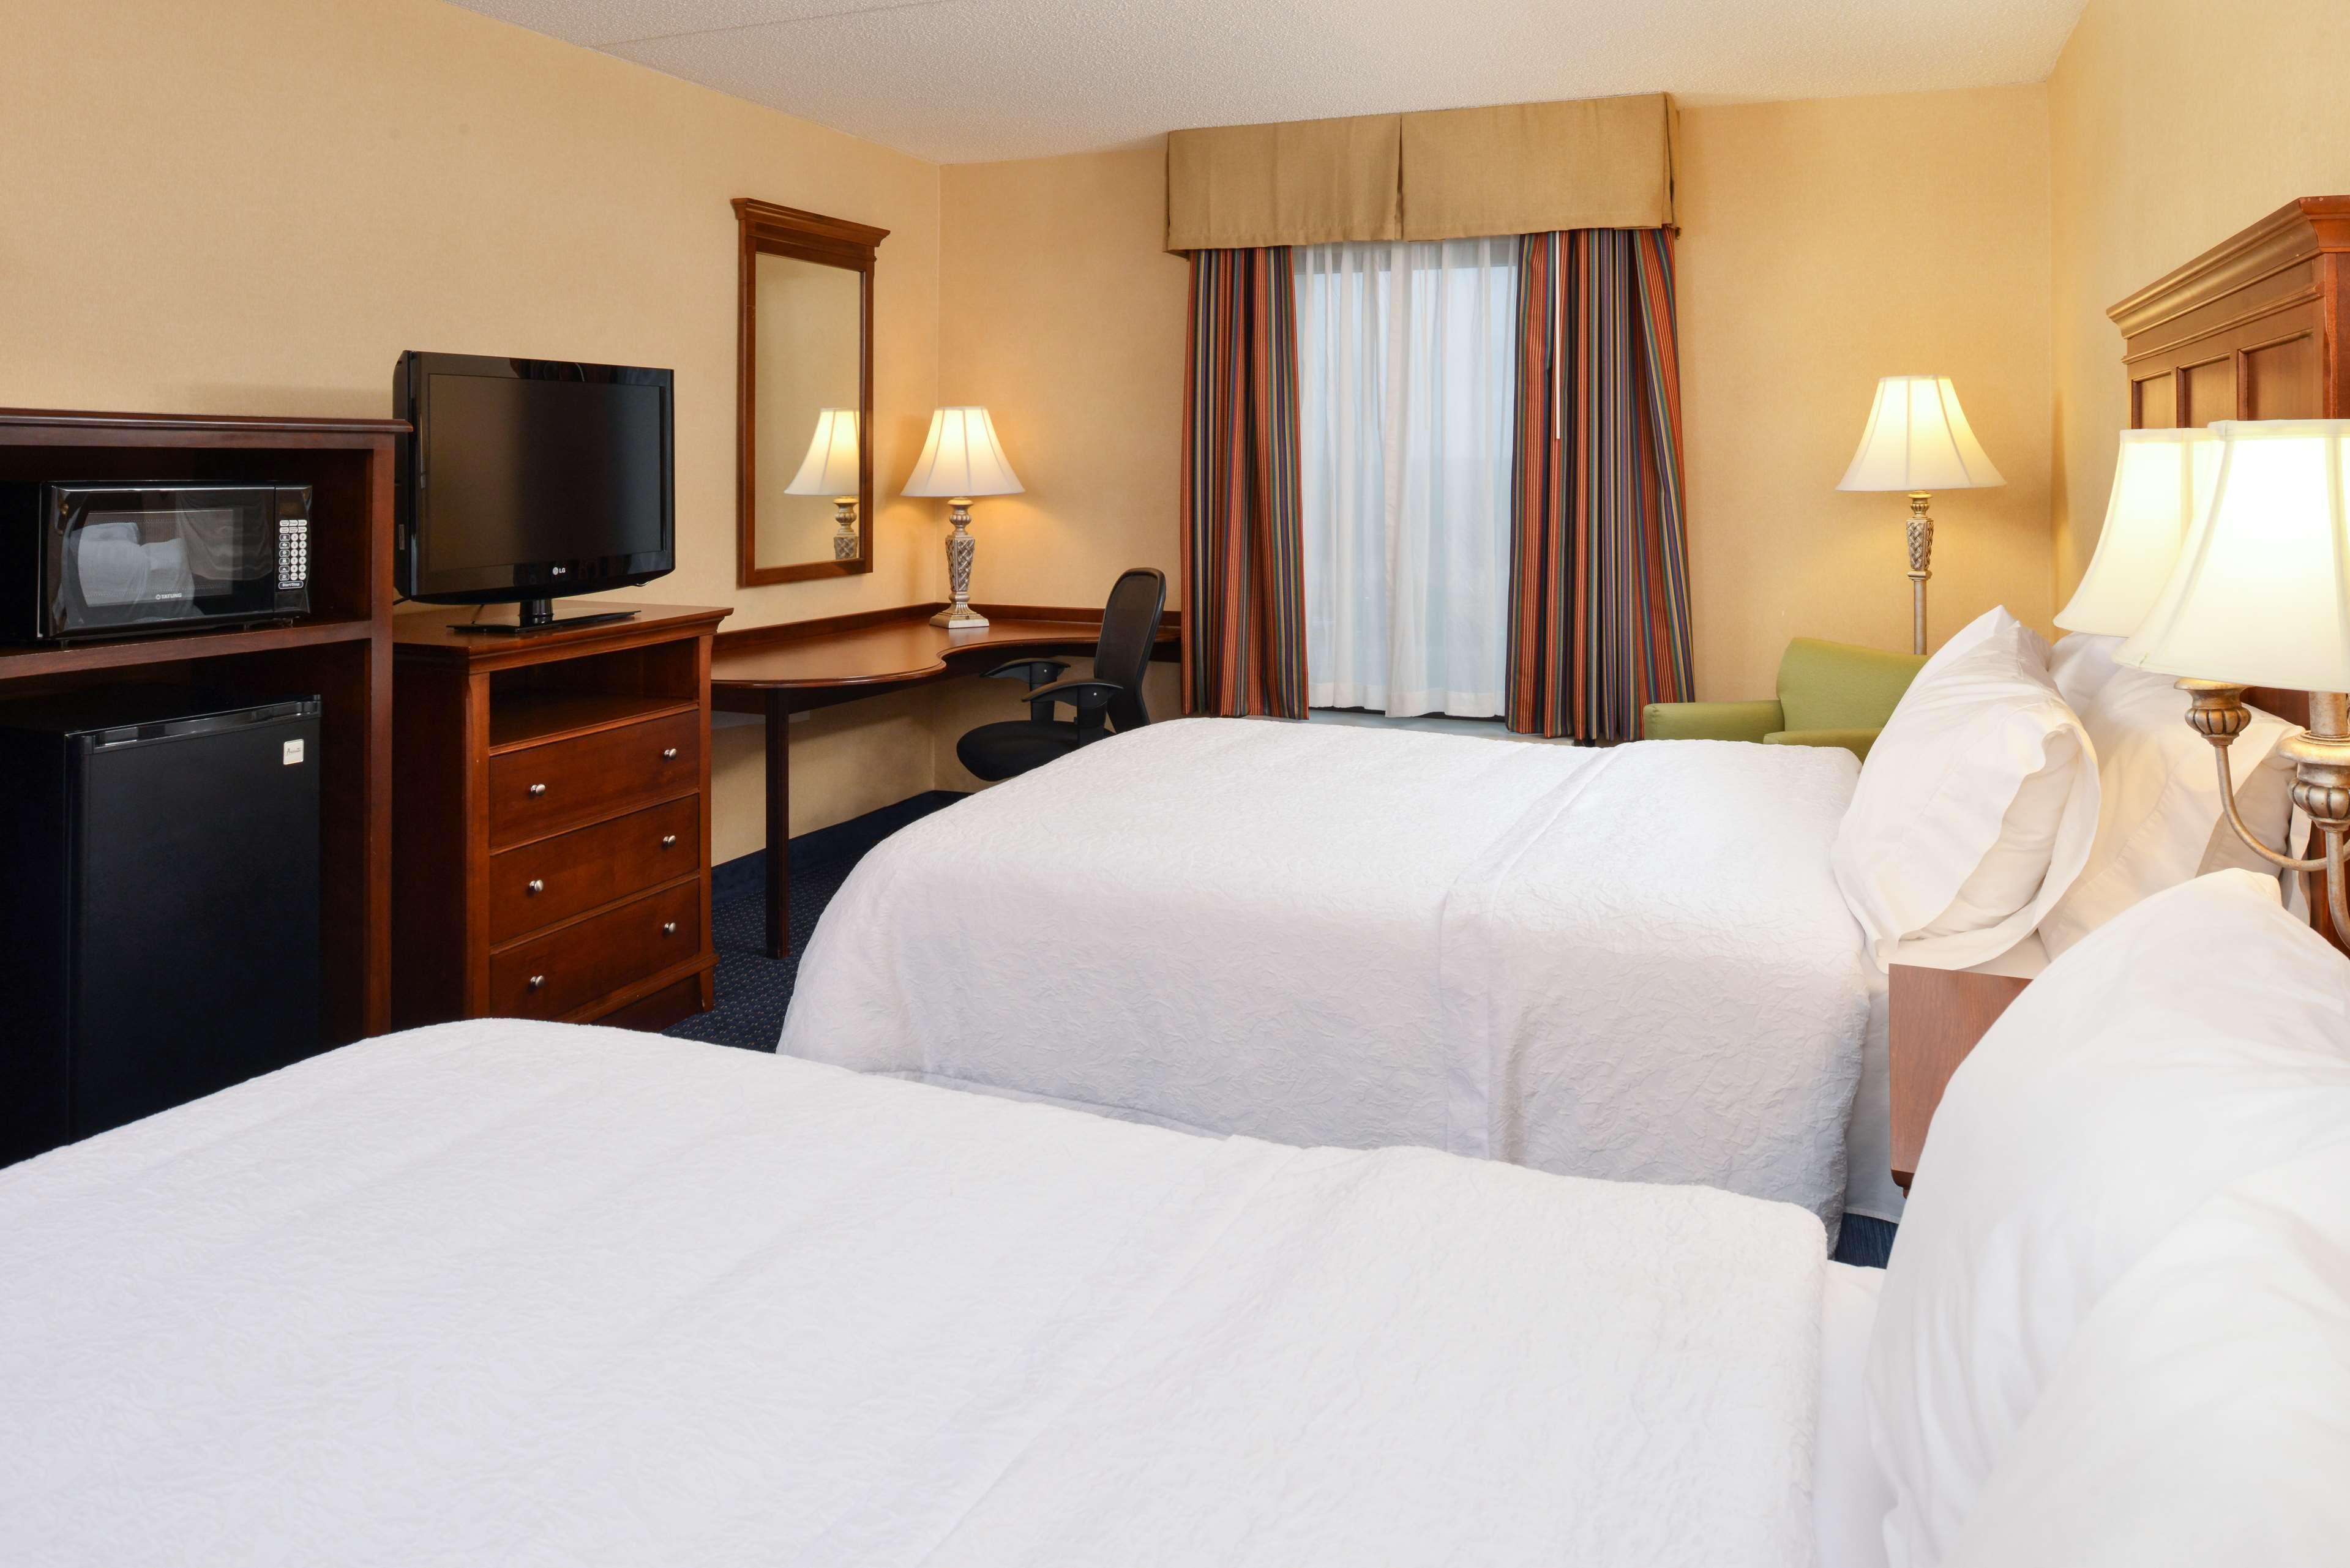 Hampton Inn & Suites Fredericksburg South image 34